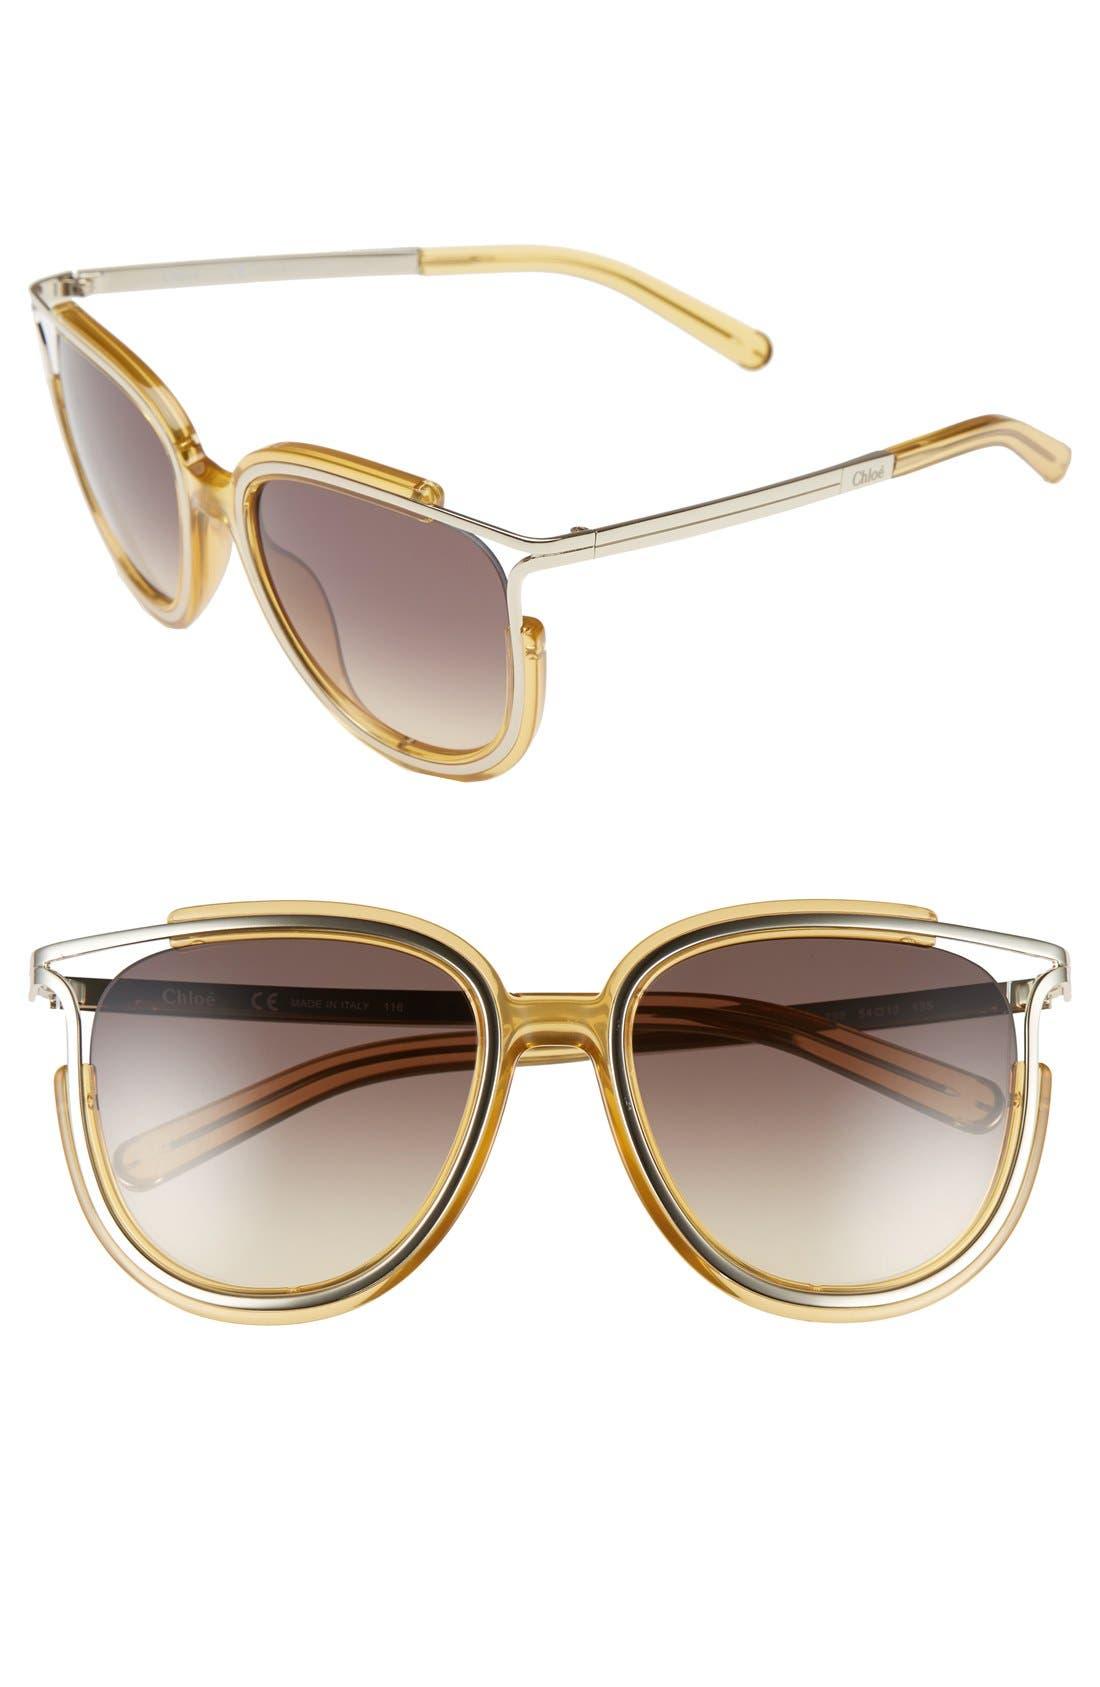 Main Image - Chloé 'Jayme' 54mm Retro Sunglasses